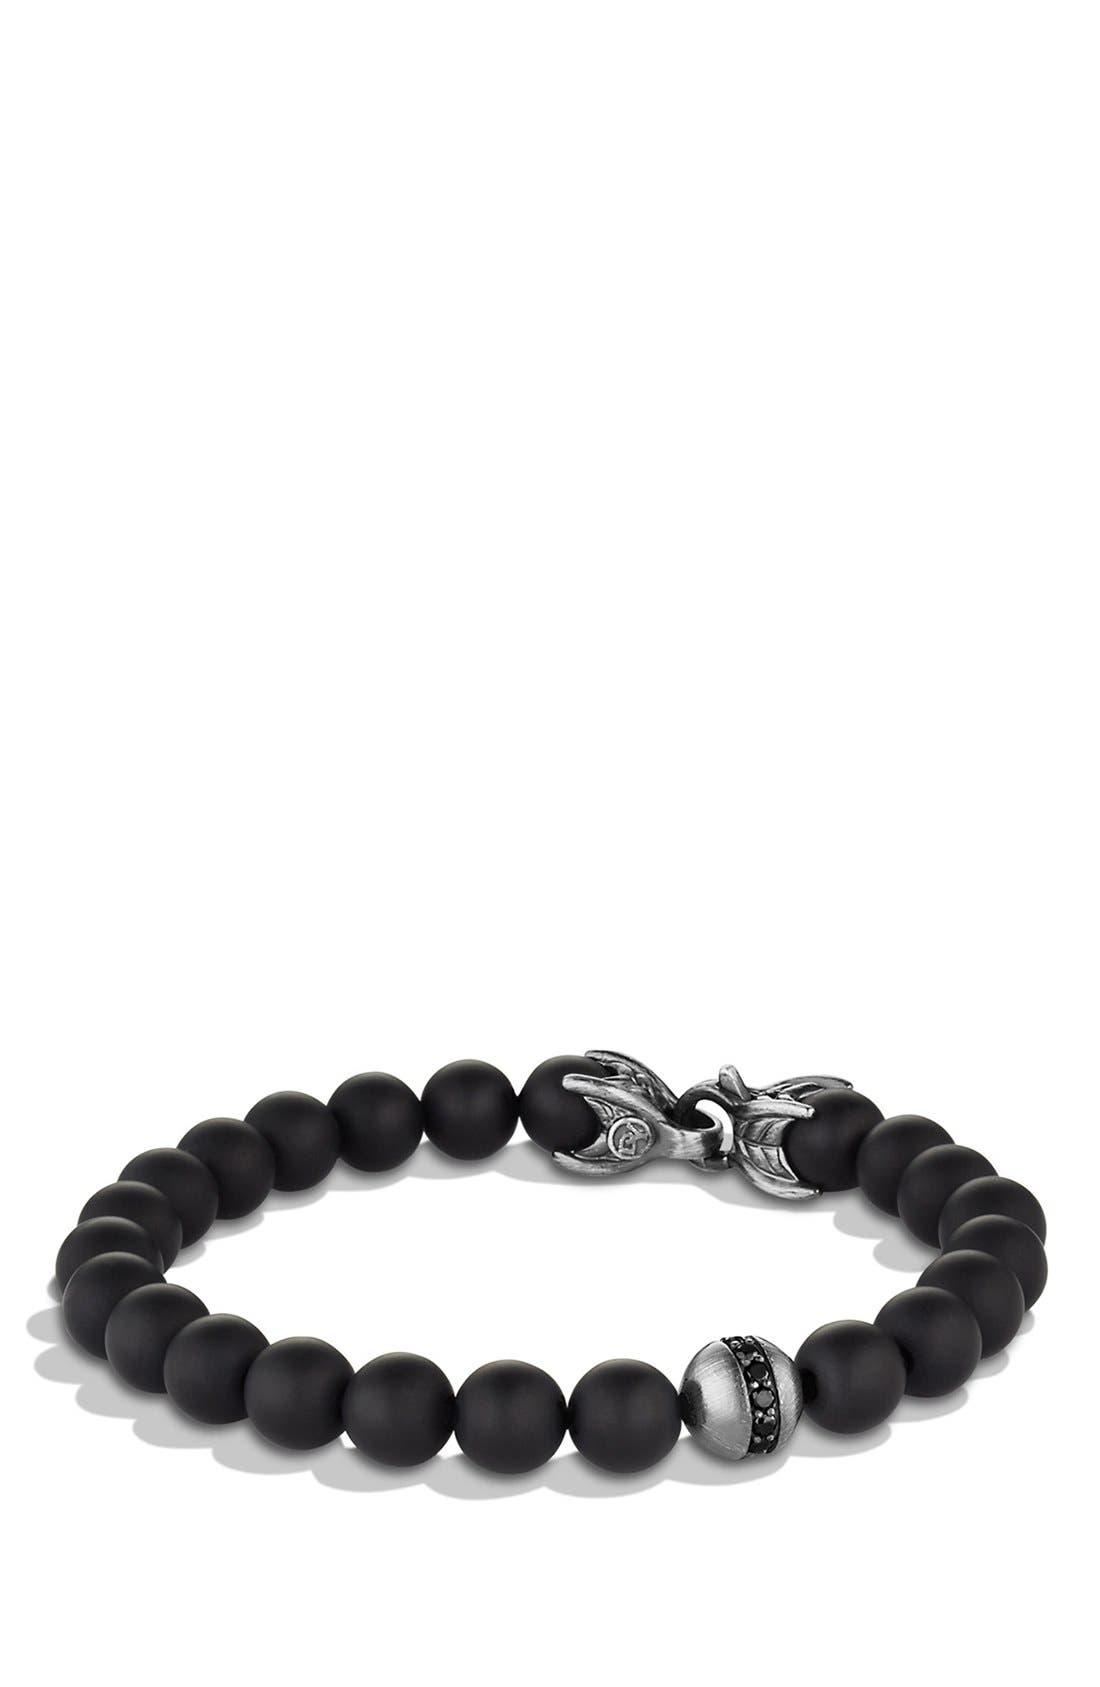 'Spiritual Beads' Bracelet with Black Onyx and Black Diamonds,                             Main thumbnail 1, color,                             BLACK ONYX